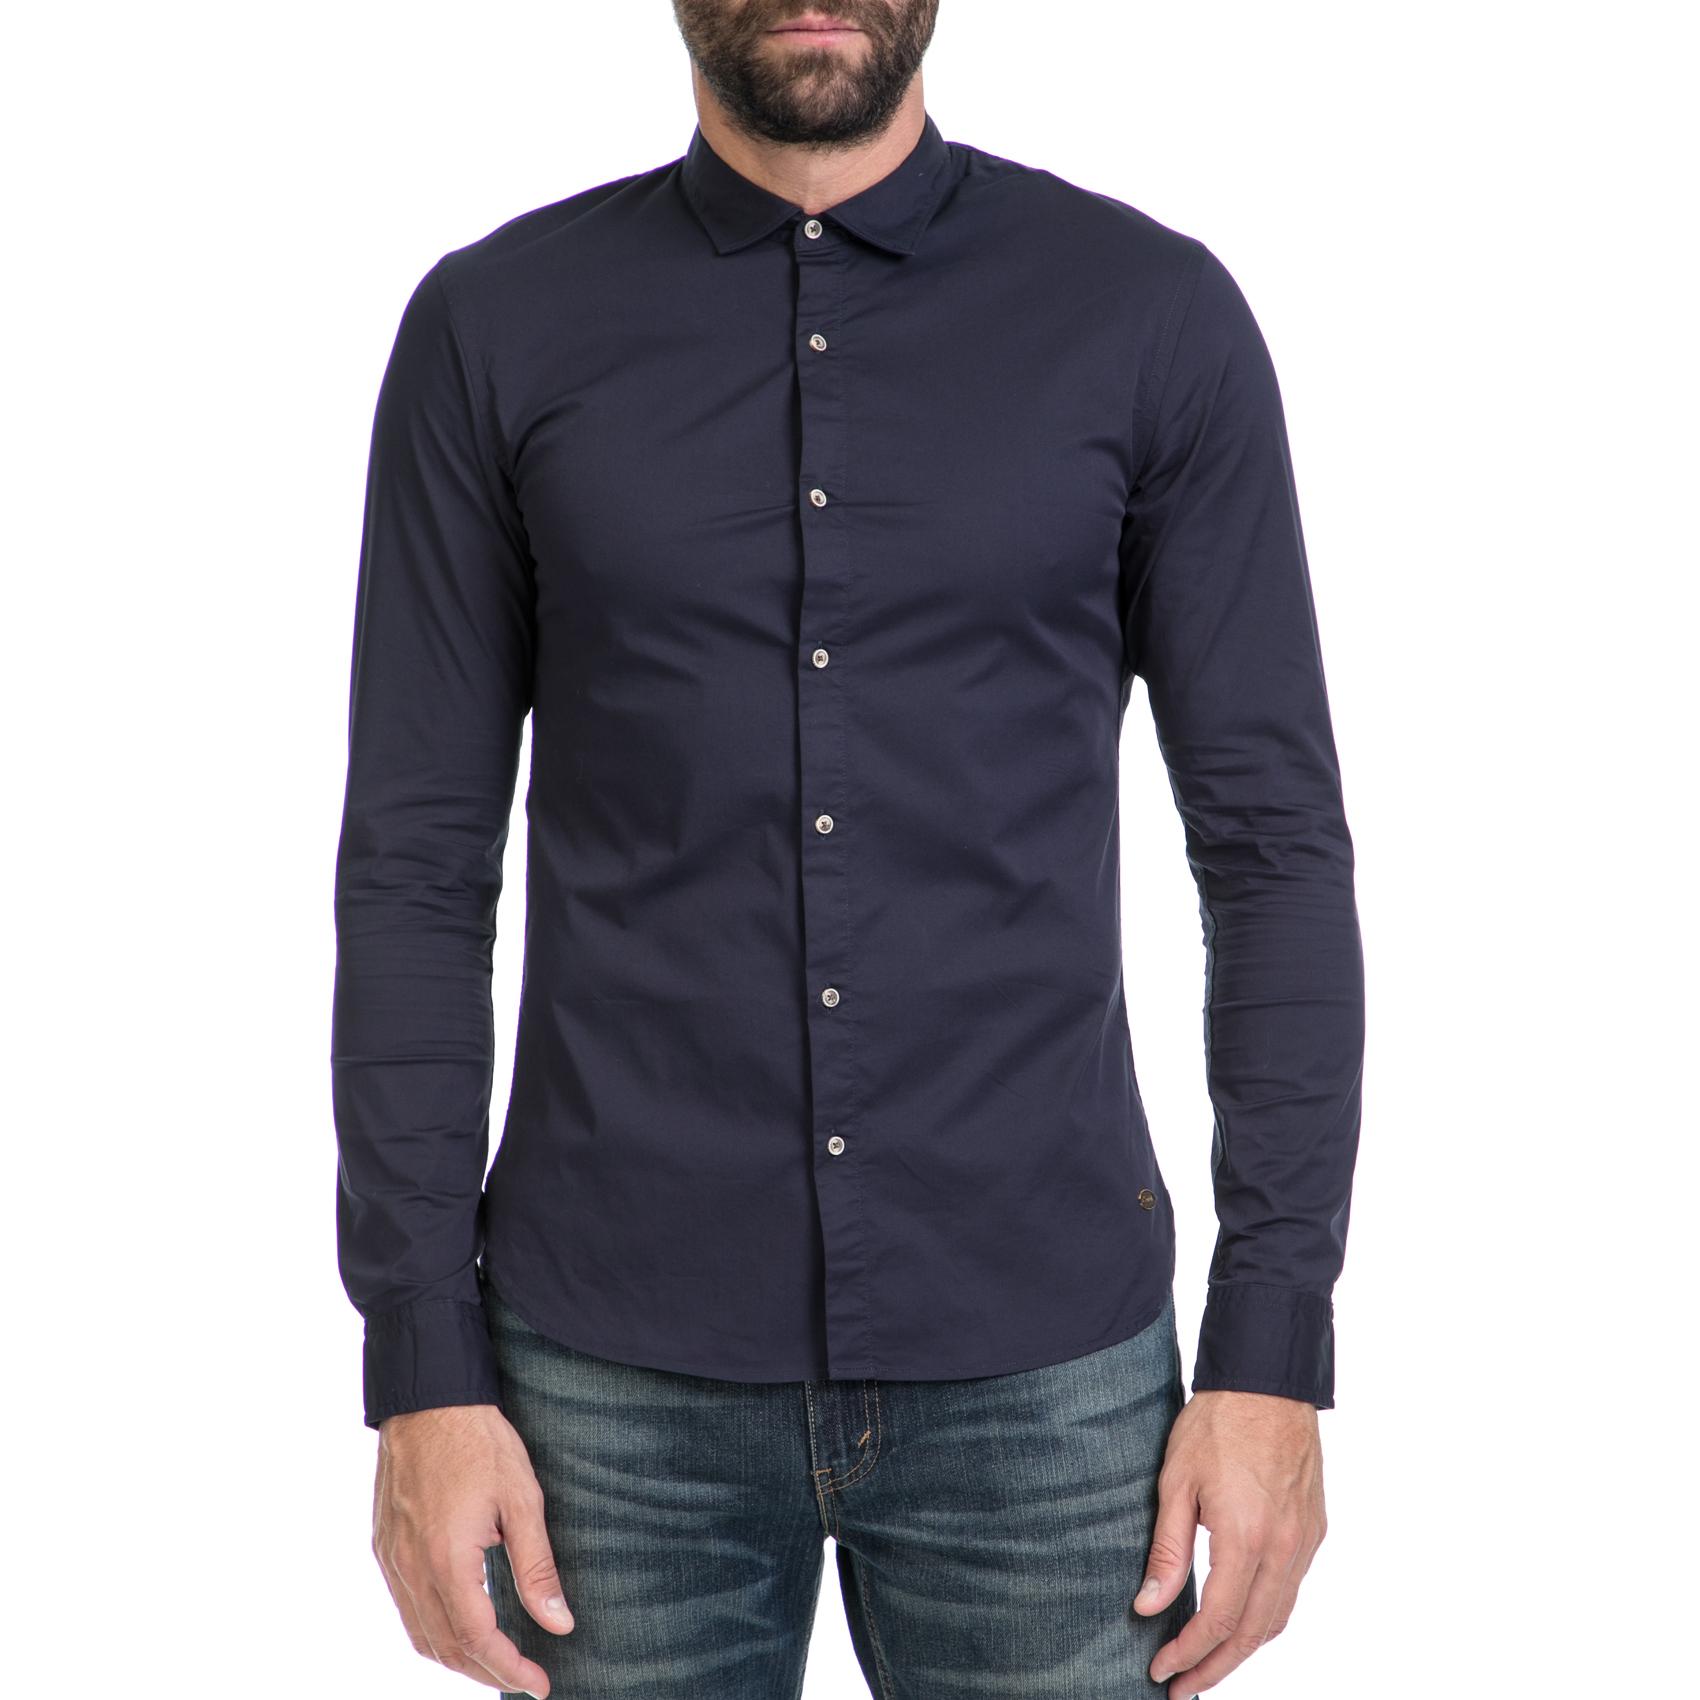 3720111d57f8 SCOTCH   SODA – Ανδρικό πουκάμισο SCOTCH   SODA μπλε 1467893.0-00G8 39